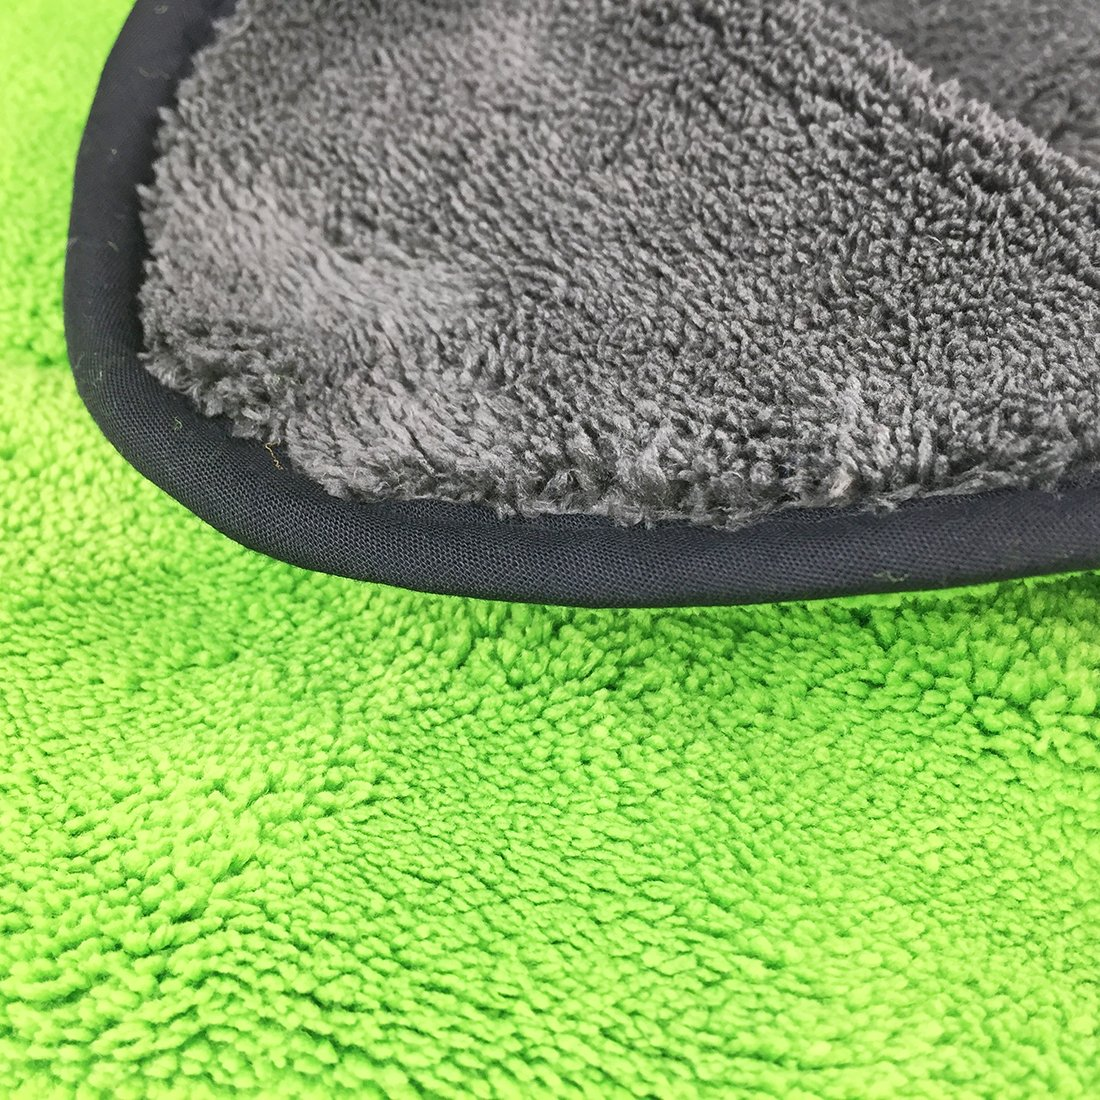 Toalla de microfibra para limpieza de coche 3c1fb2d212bd